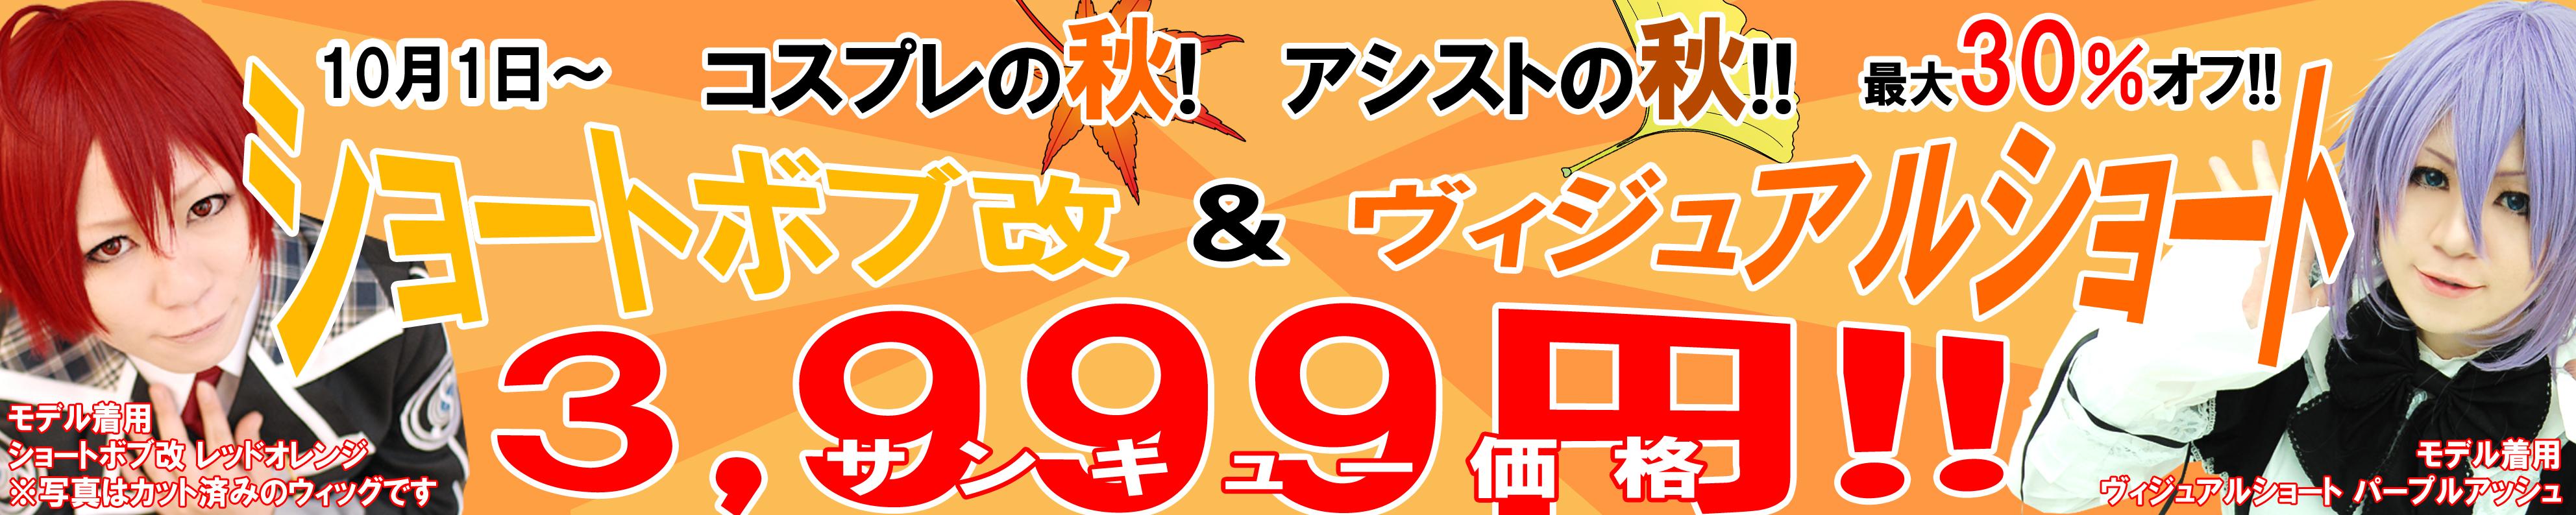 http://osaka-nihonbashi.anihiro.jp/images/2012100101.jpg